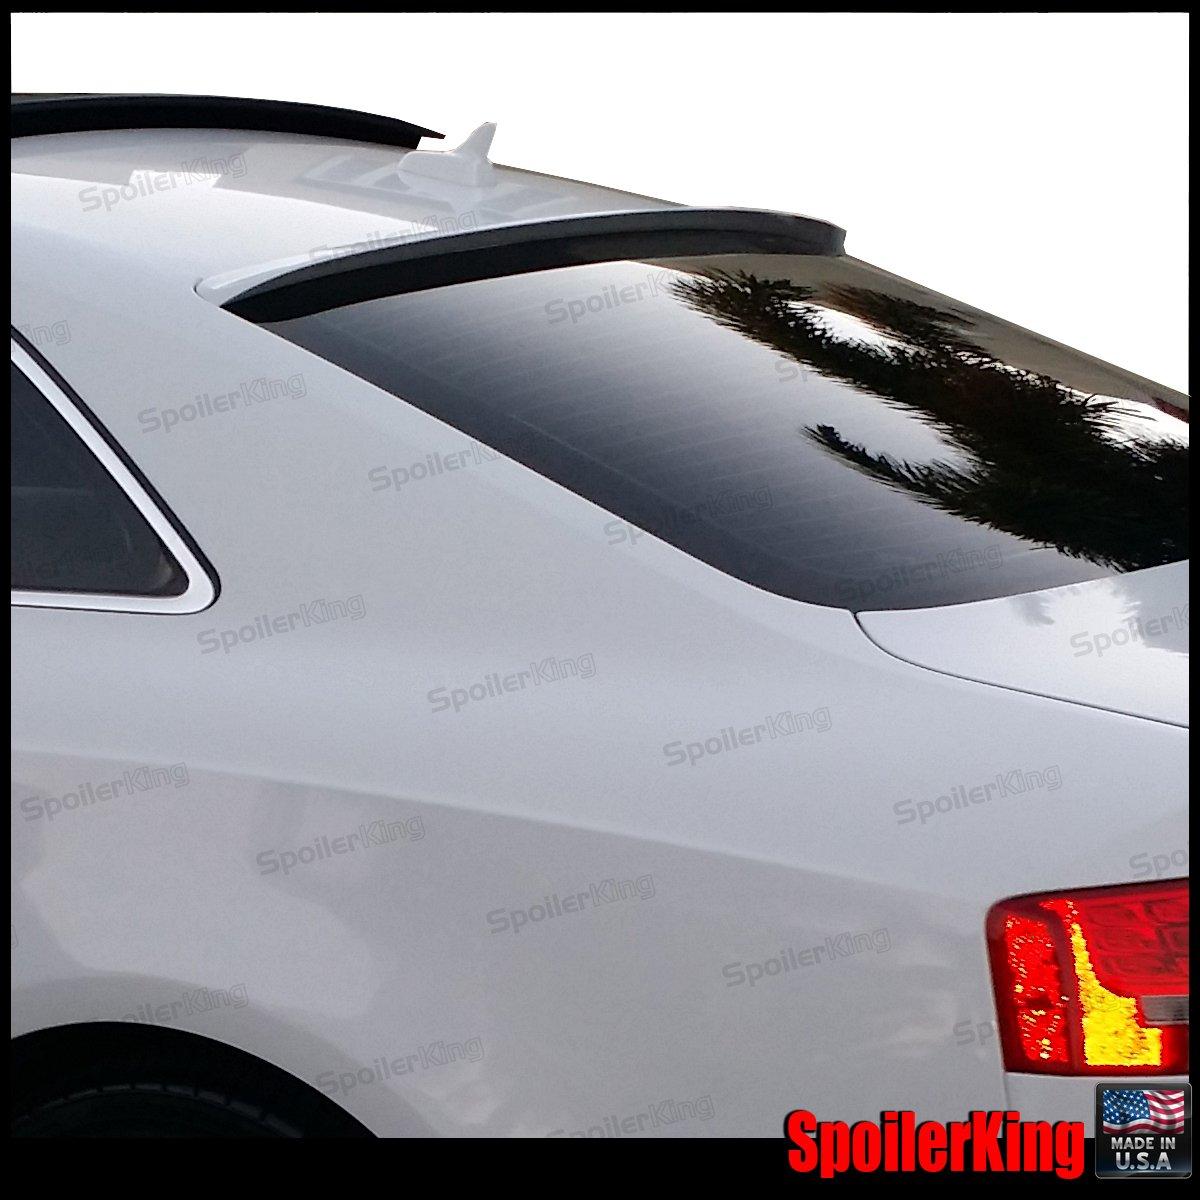 Amazon.com: Audi A5 2008-on Rear Window Roof Spoiler (701142665842 ...